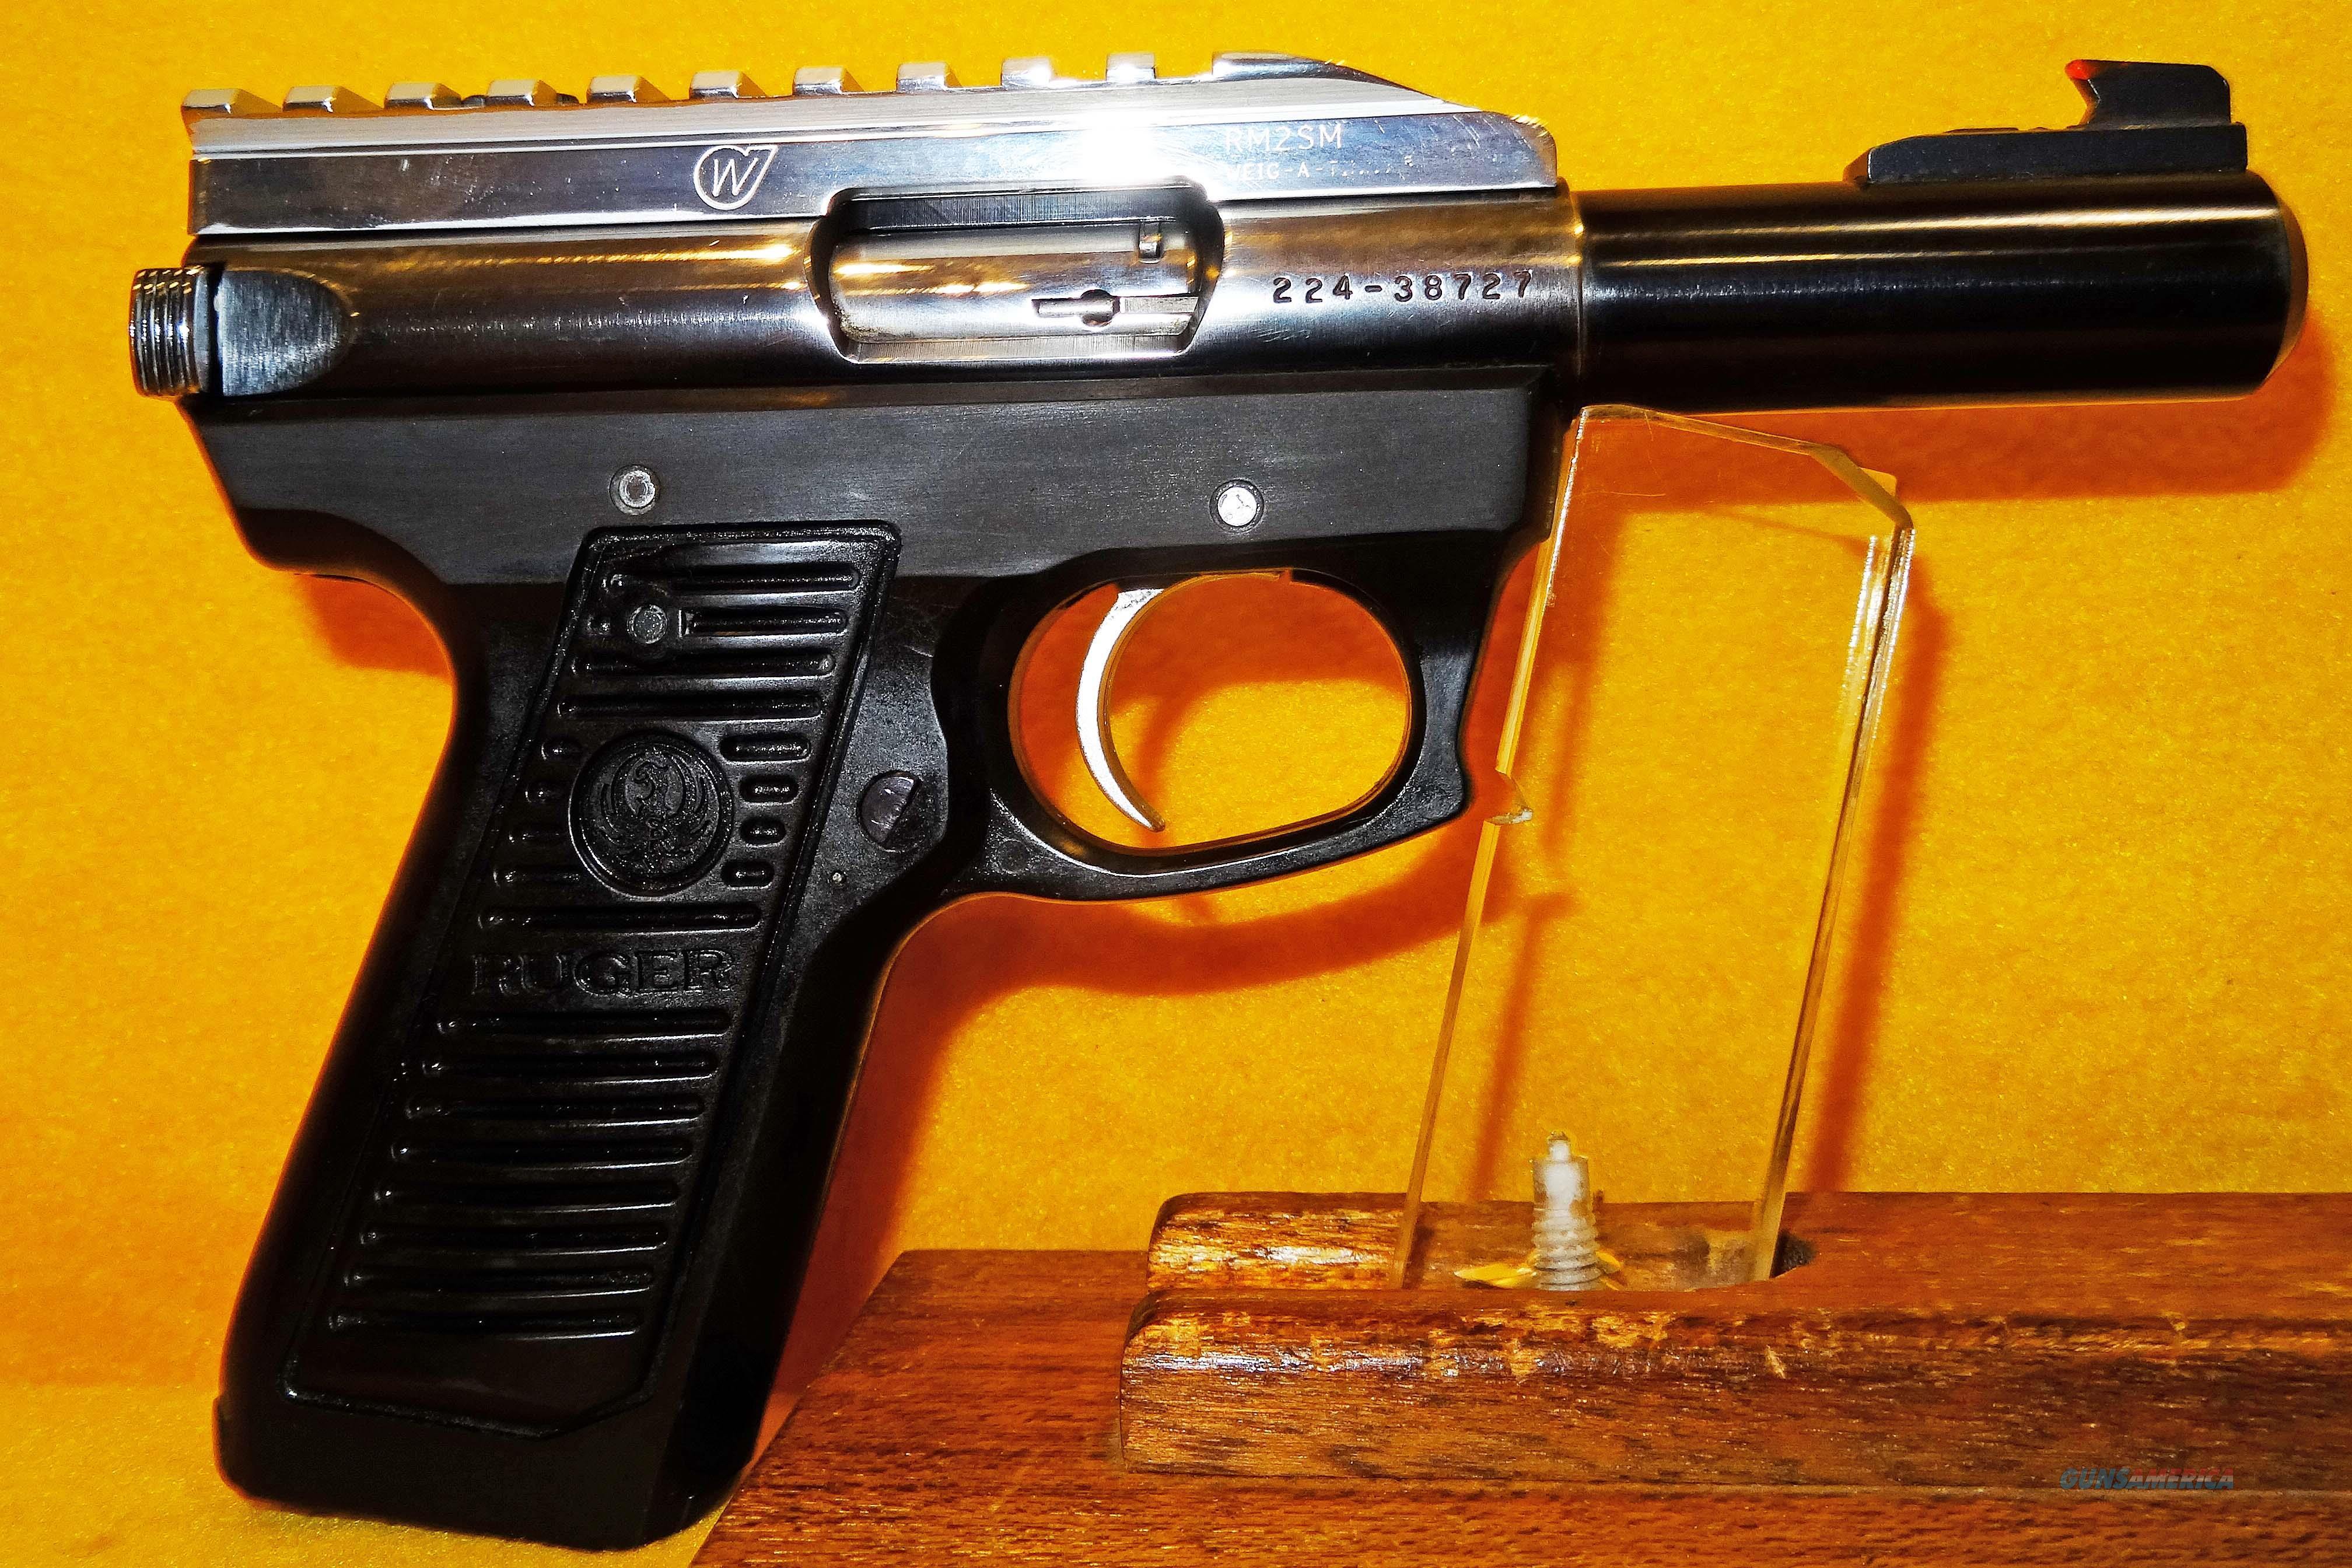 RUGER 22/45  Guns > Pistols > Ruger Semi-Auto Pistols > Mark I/II/III/IV Family